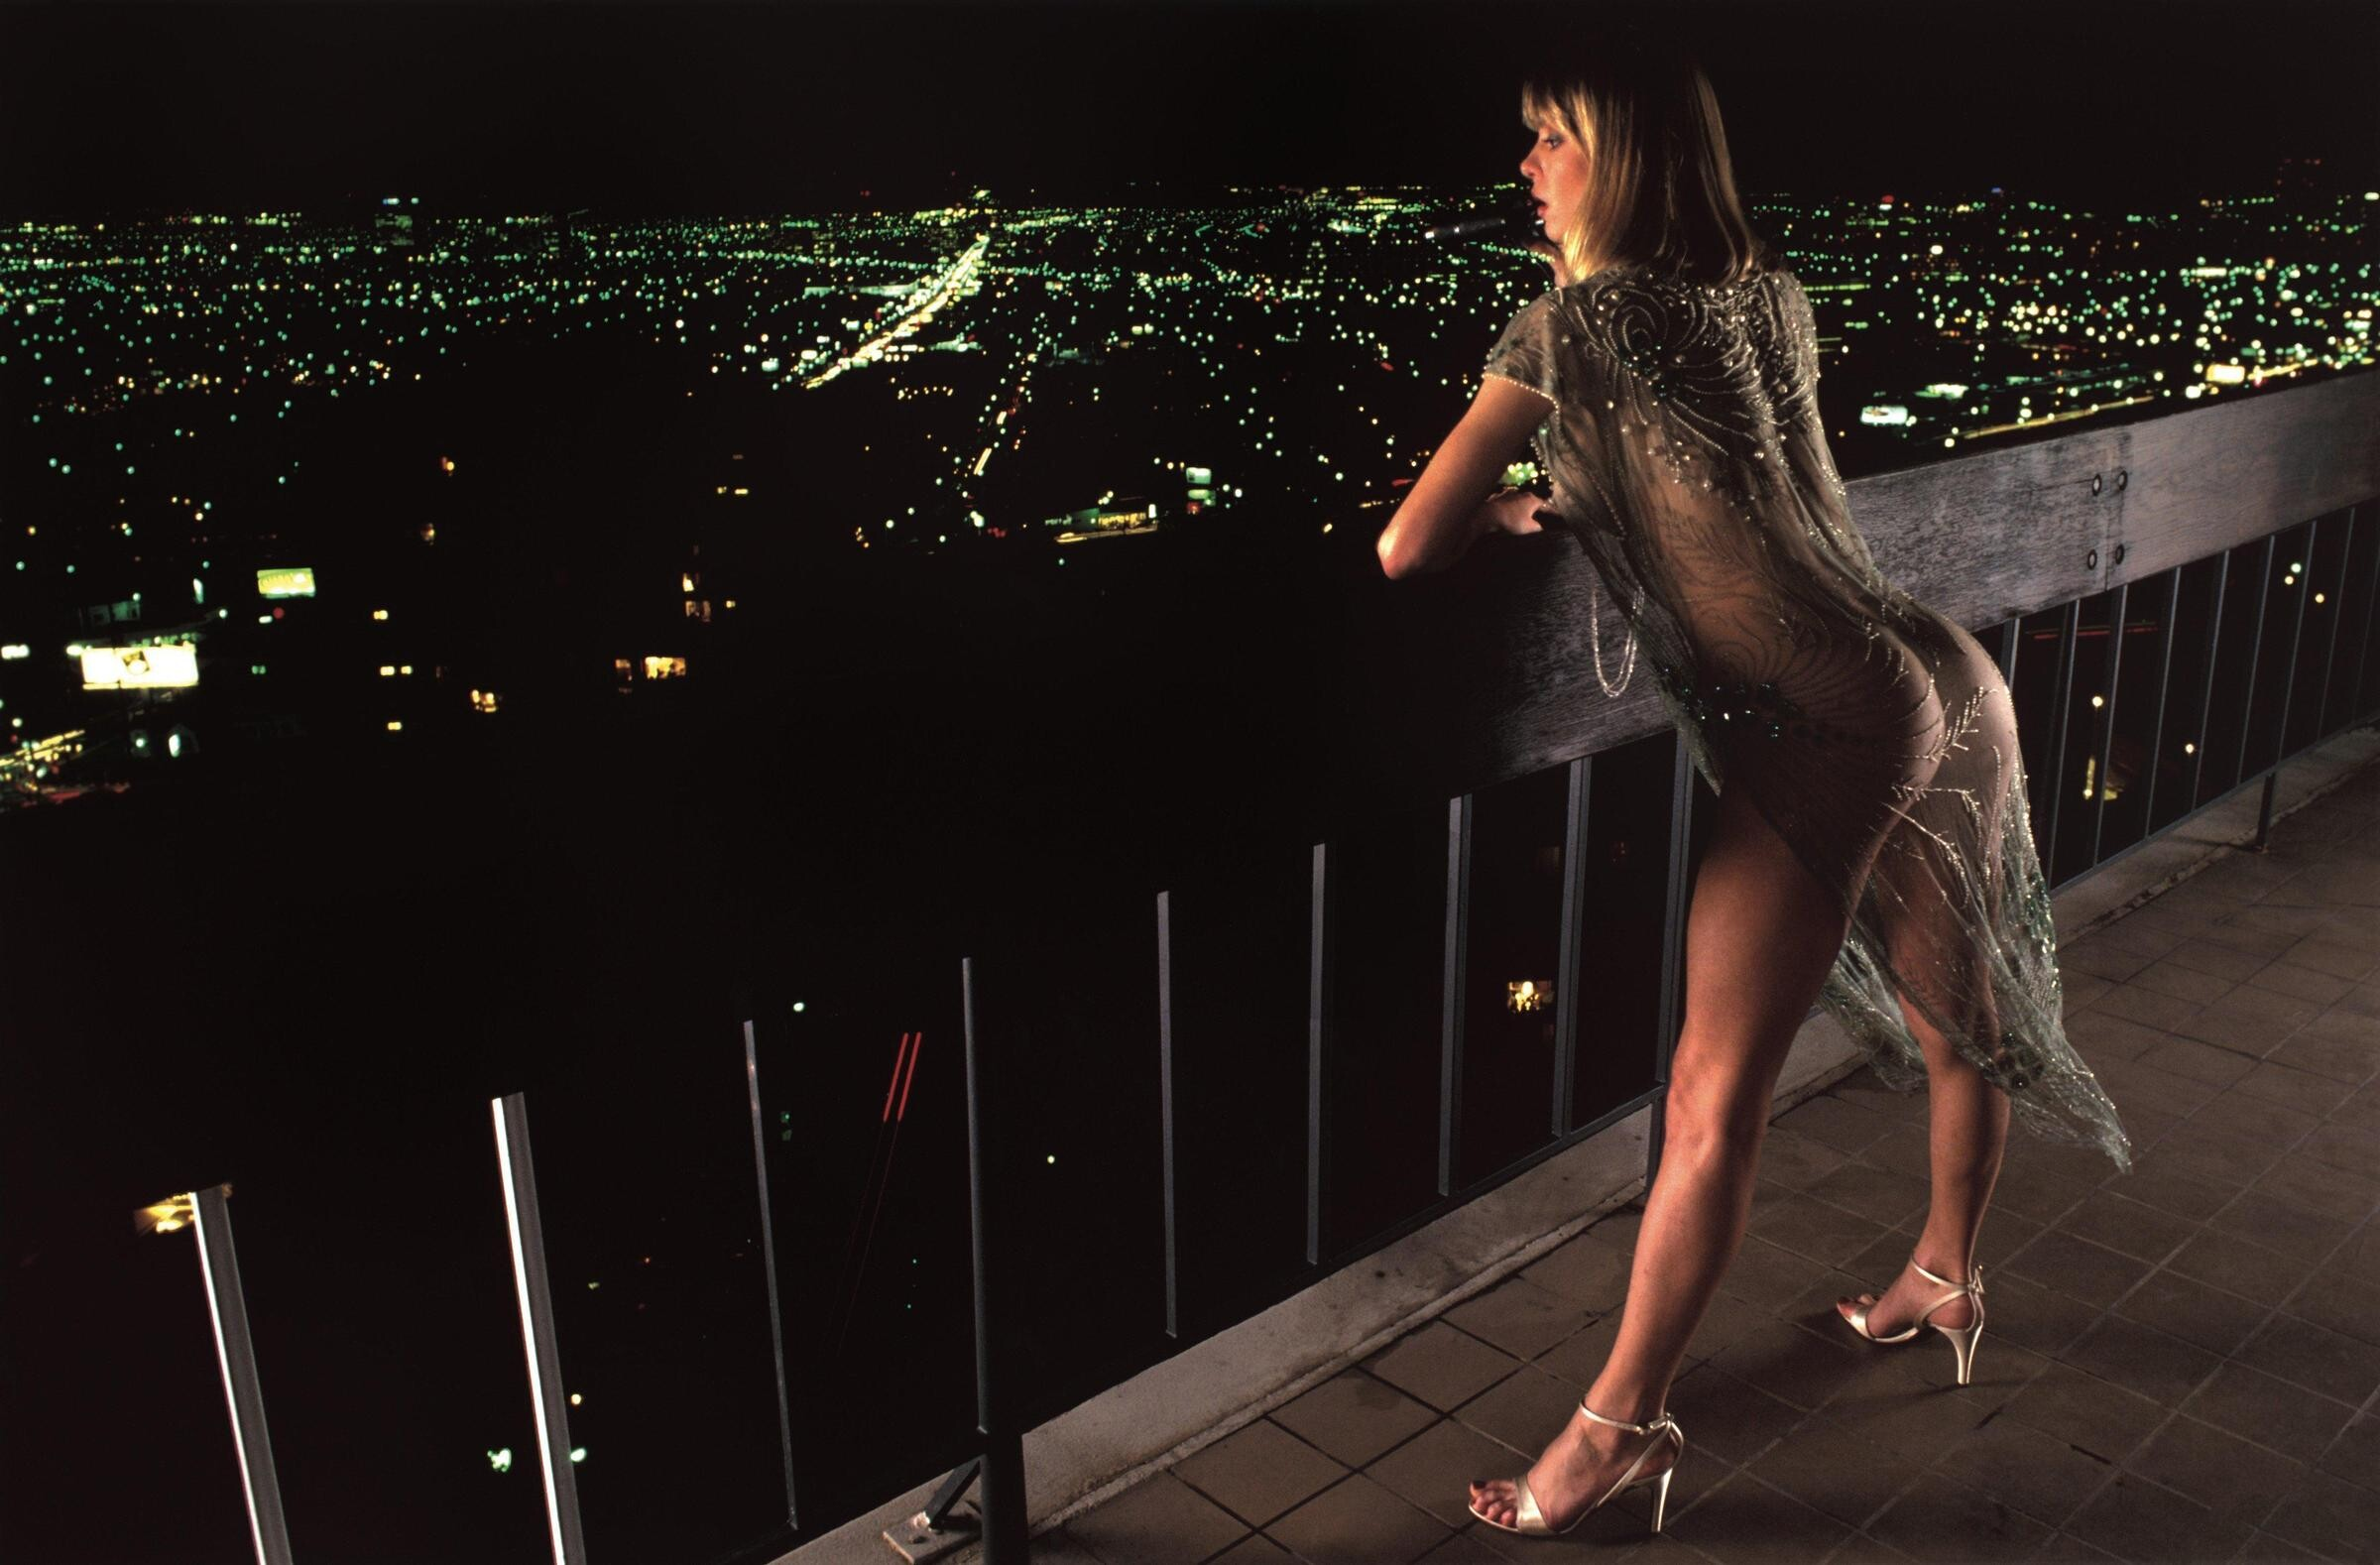 Моника Ст. Пьер, огни Лос-Анджелеса, июнь 1979 года. Фотограф Ричард Фегли